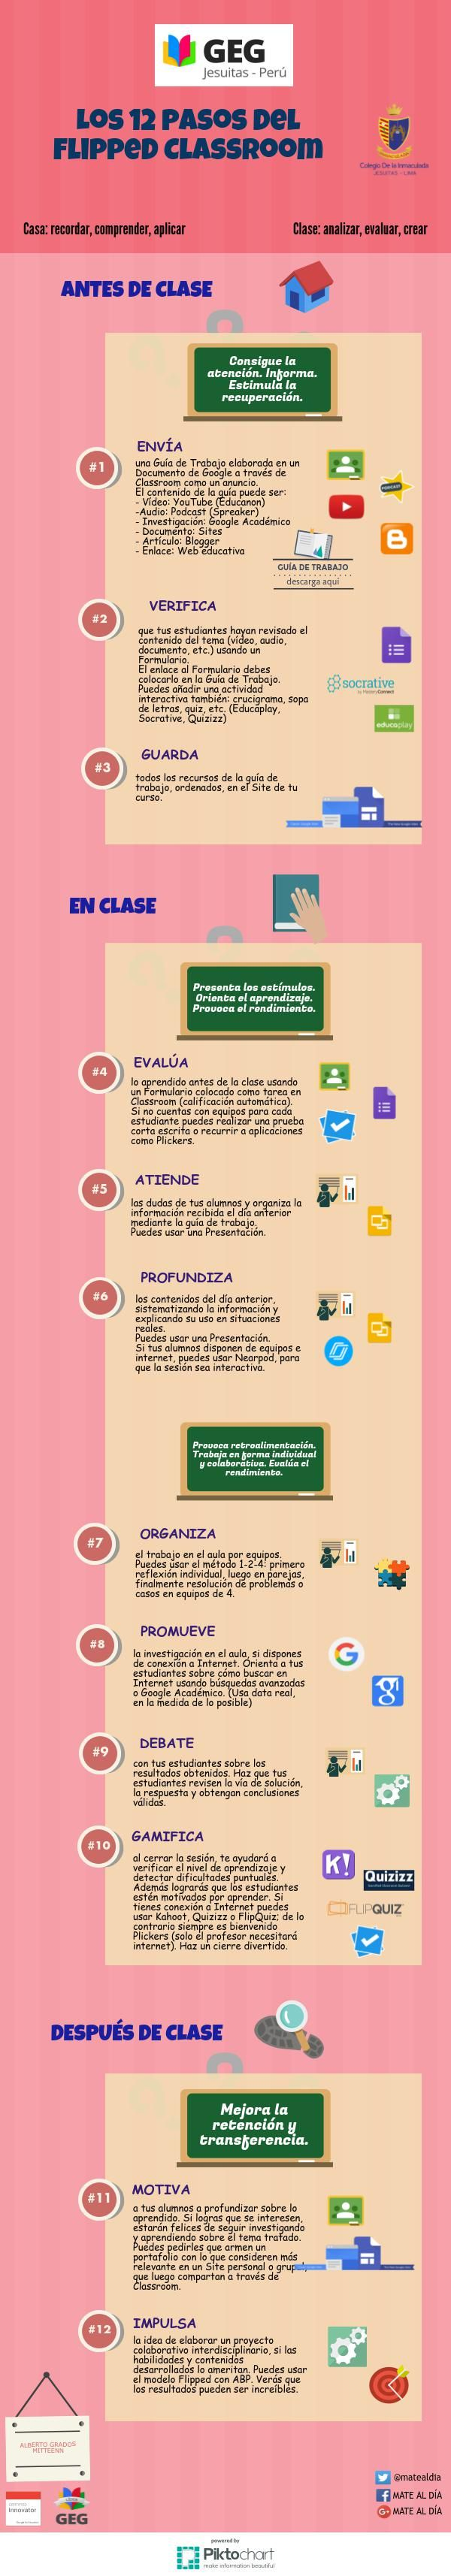 Los 12 Pasos del Flipped Classroom   @Piktochart Infographic